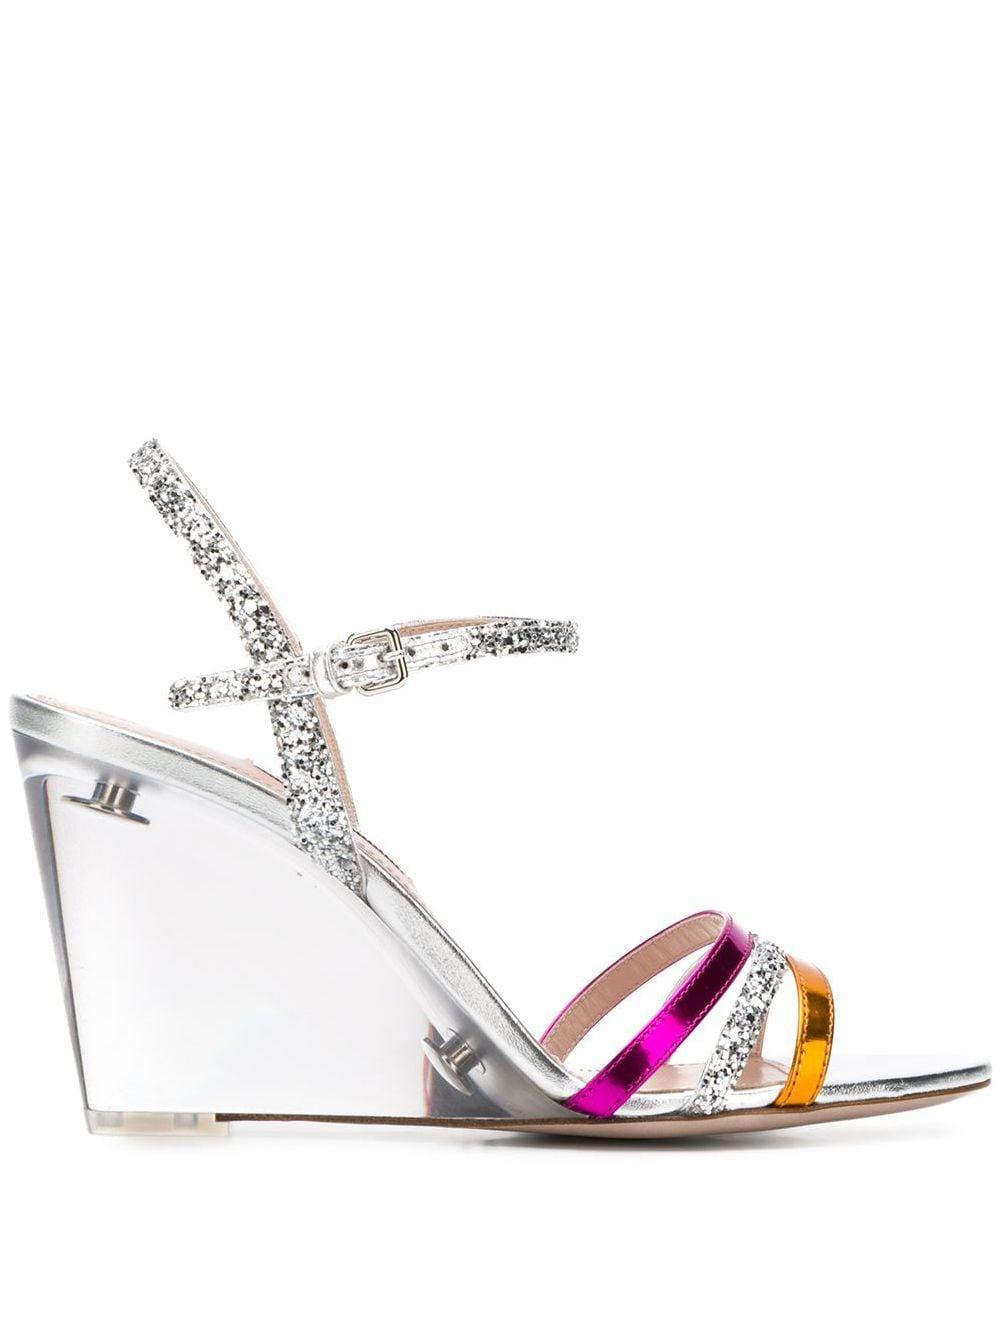 Miu Miu Wedge-Sandalen mit Glitter - Silber